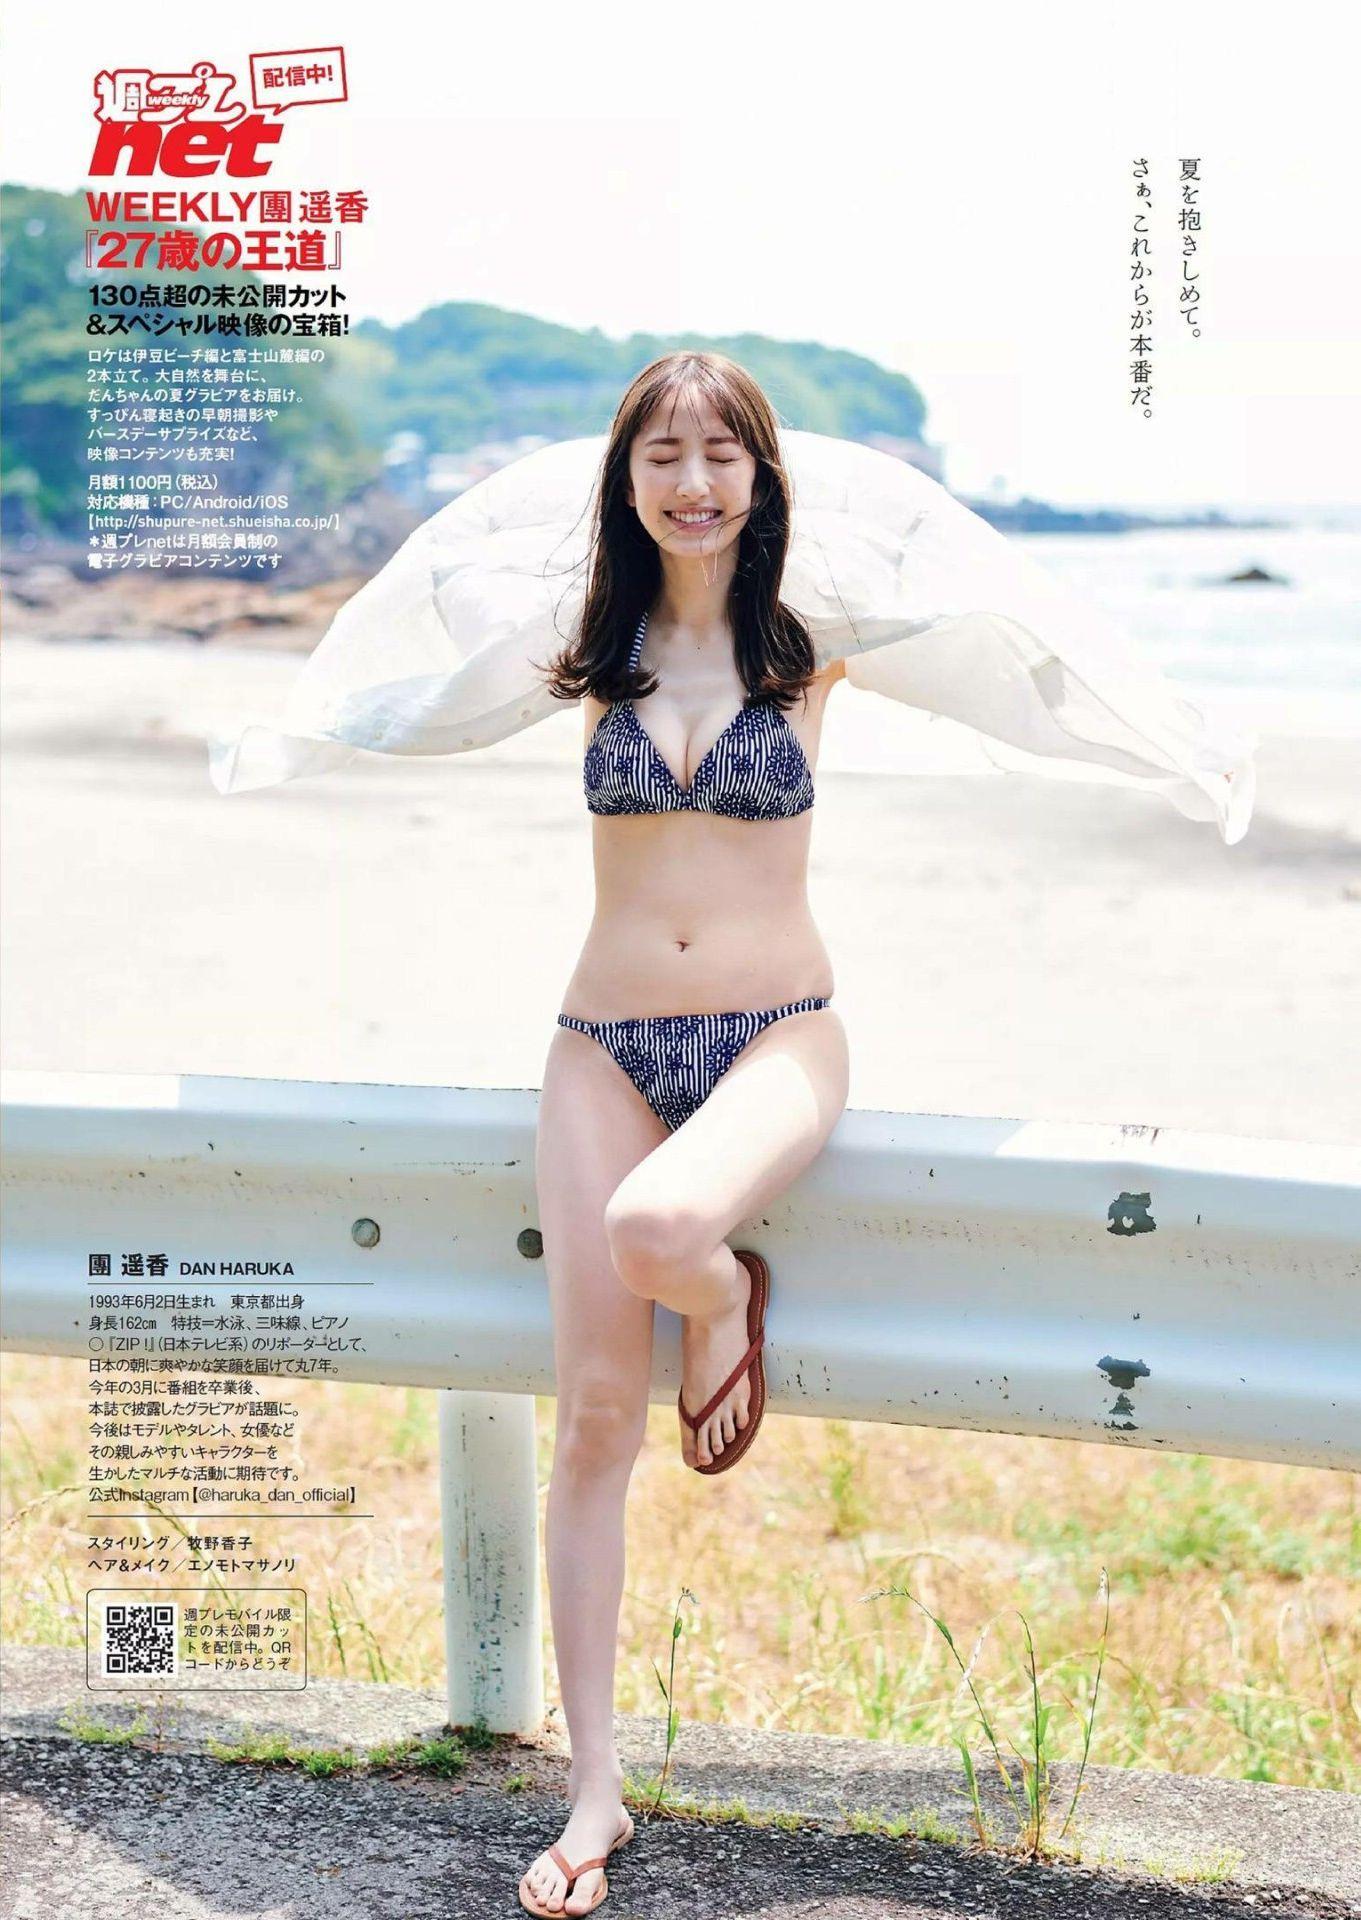 Weekly Playboy No.10